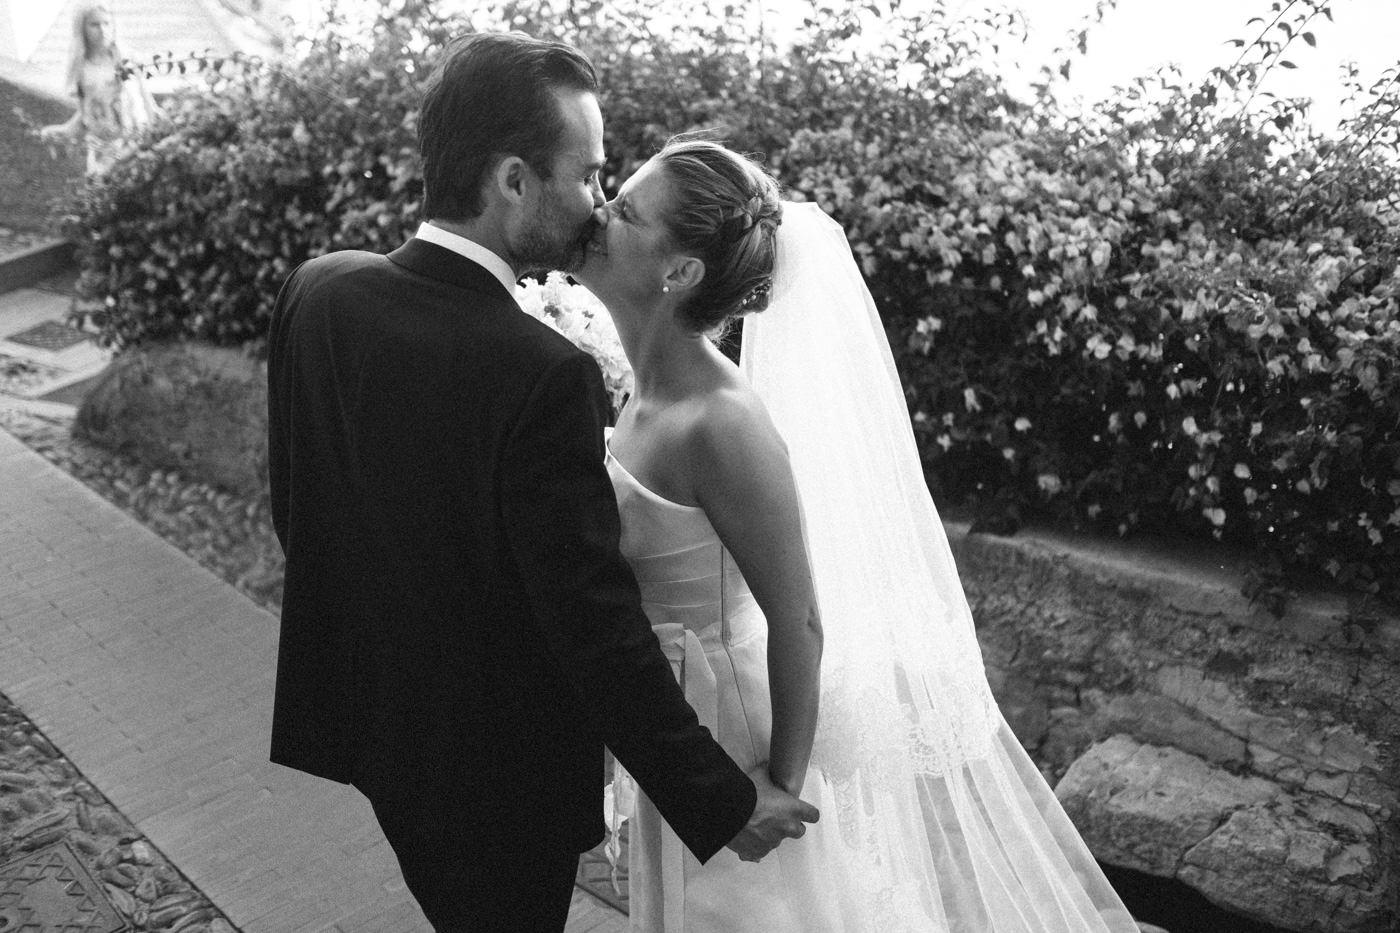 matrimoni_all_italiana_fotografo_matrimonio_cinque_terre-48.jpg